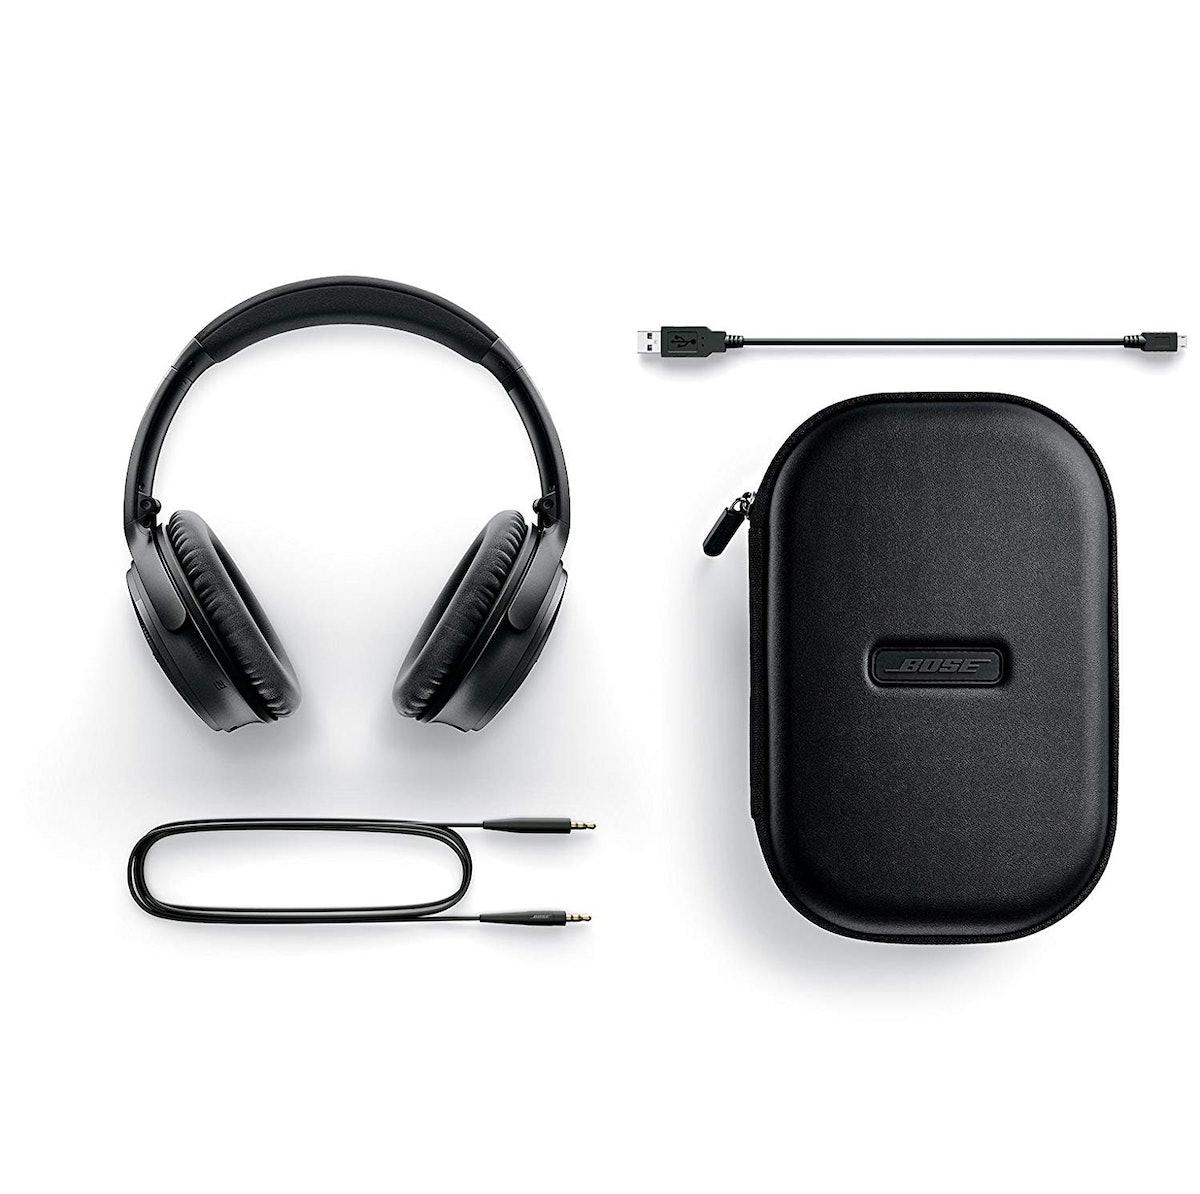 Bose QuietComfort 35 (Series II) Wireless Headphones, Noise Cancelling, With Alexa Voice Control - B...